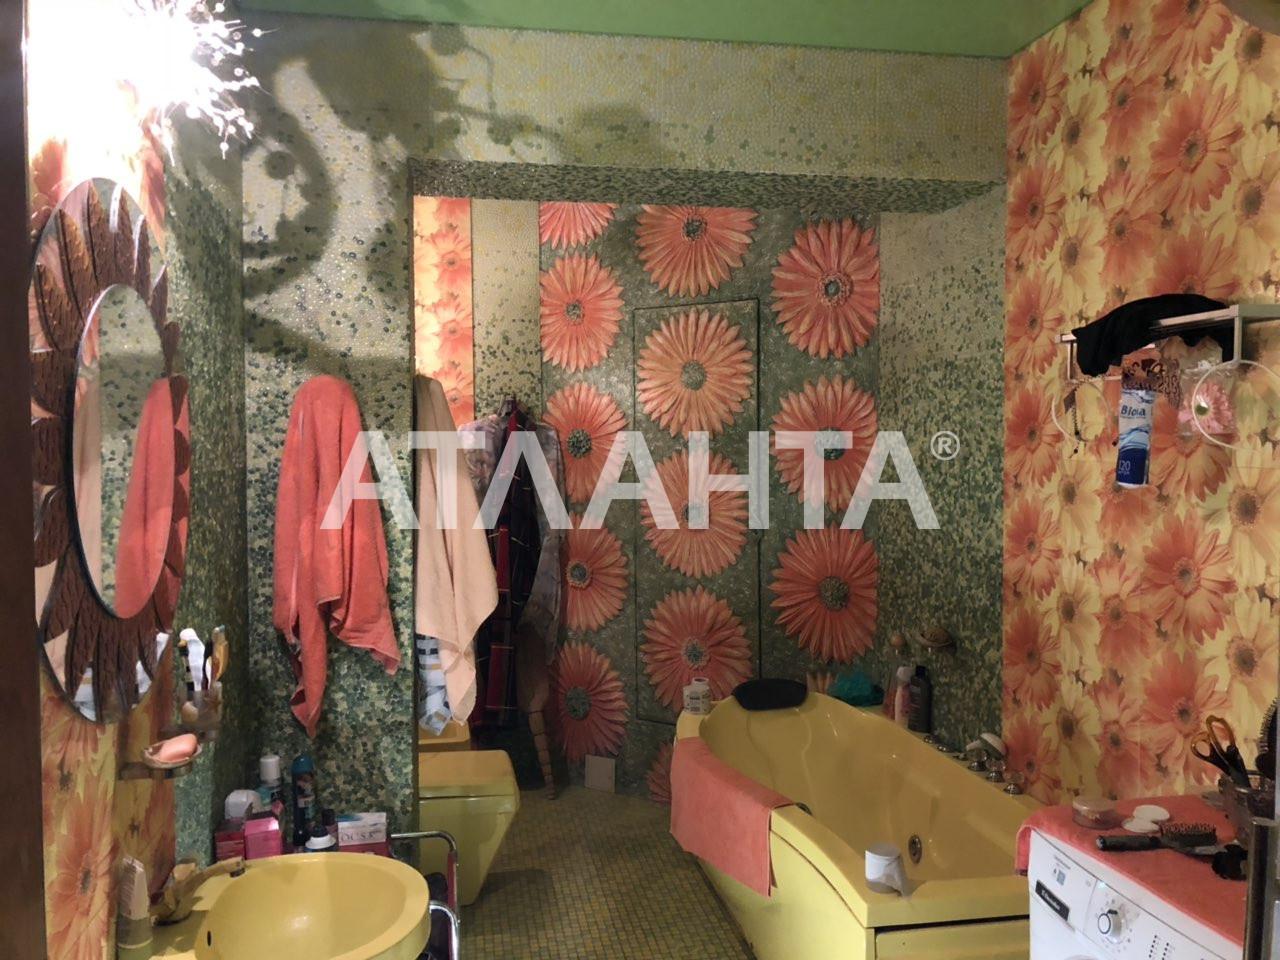 Продается 3-комнатная Квартира на ул. 1 Мая — 135 000 у.е. (фото №13)